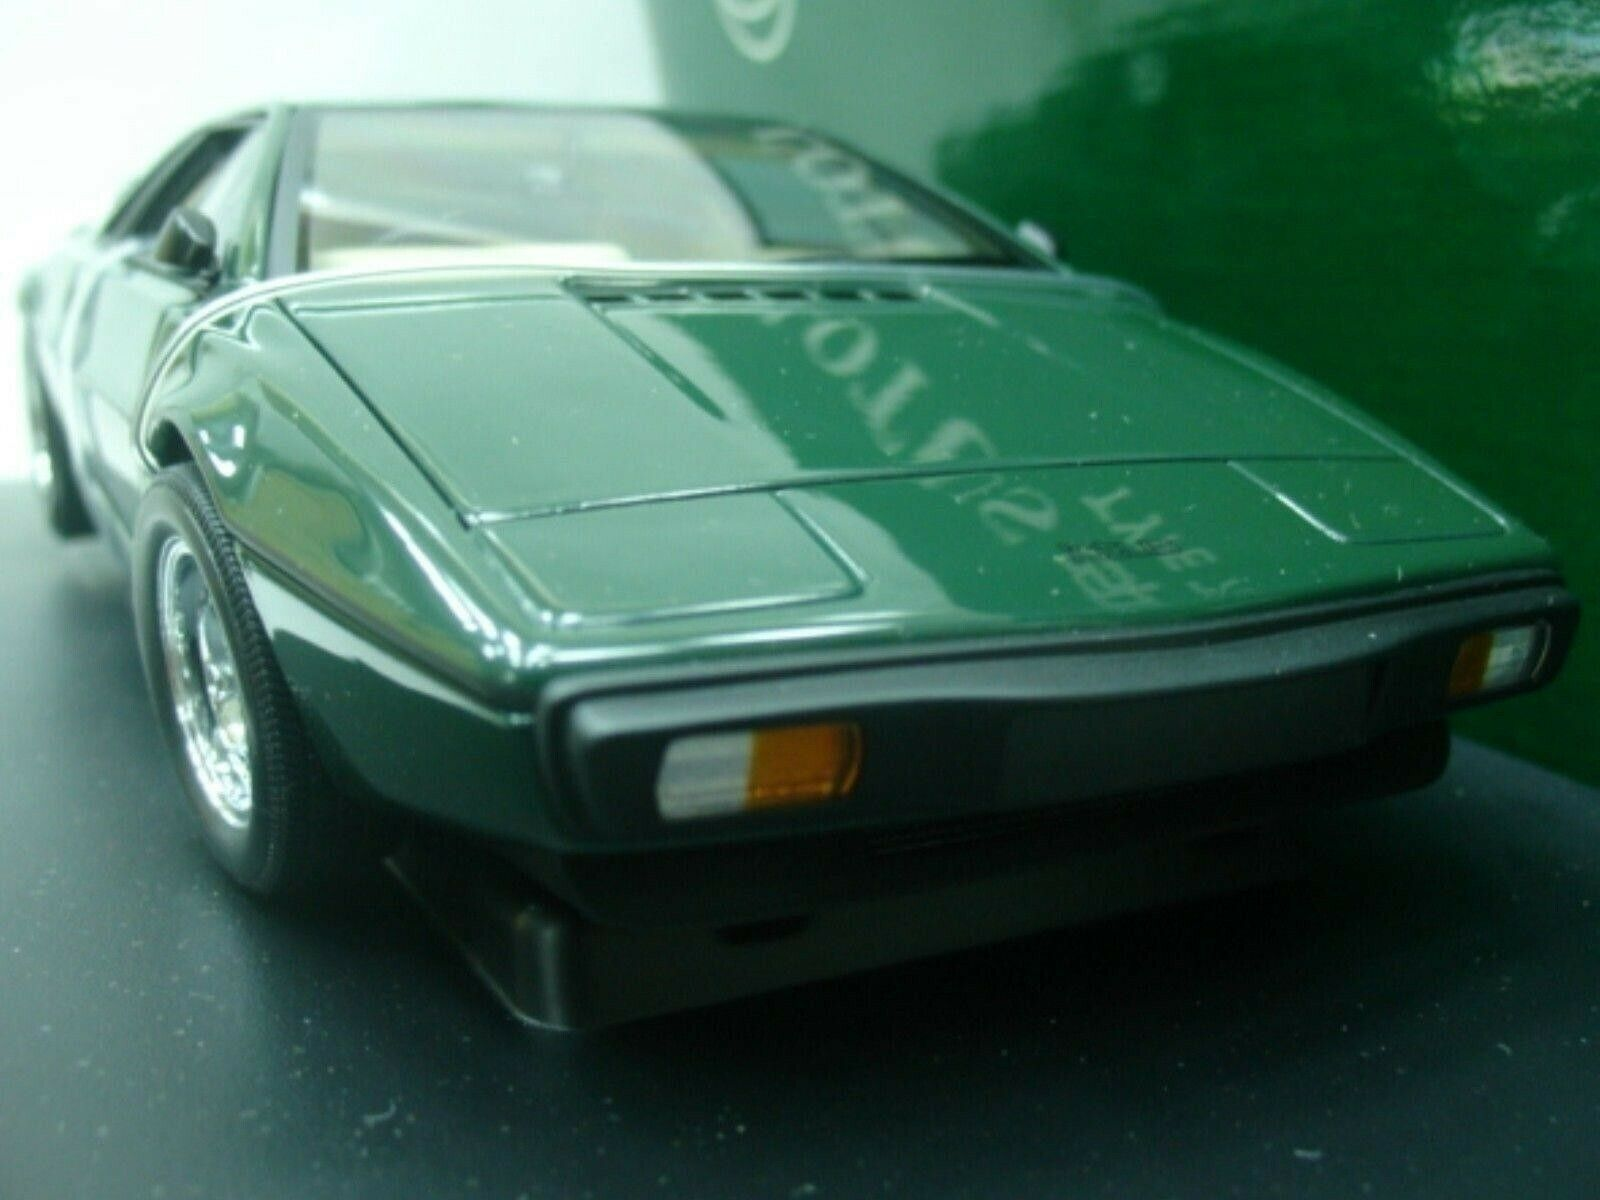 WOW EXTREMELY RARE Lotus 1979 Esprit S2 RHD 160HP B.R.Green 1 18 Auto Art-111 V8